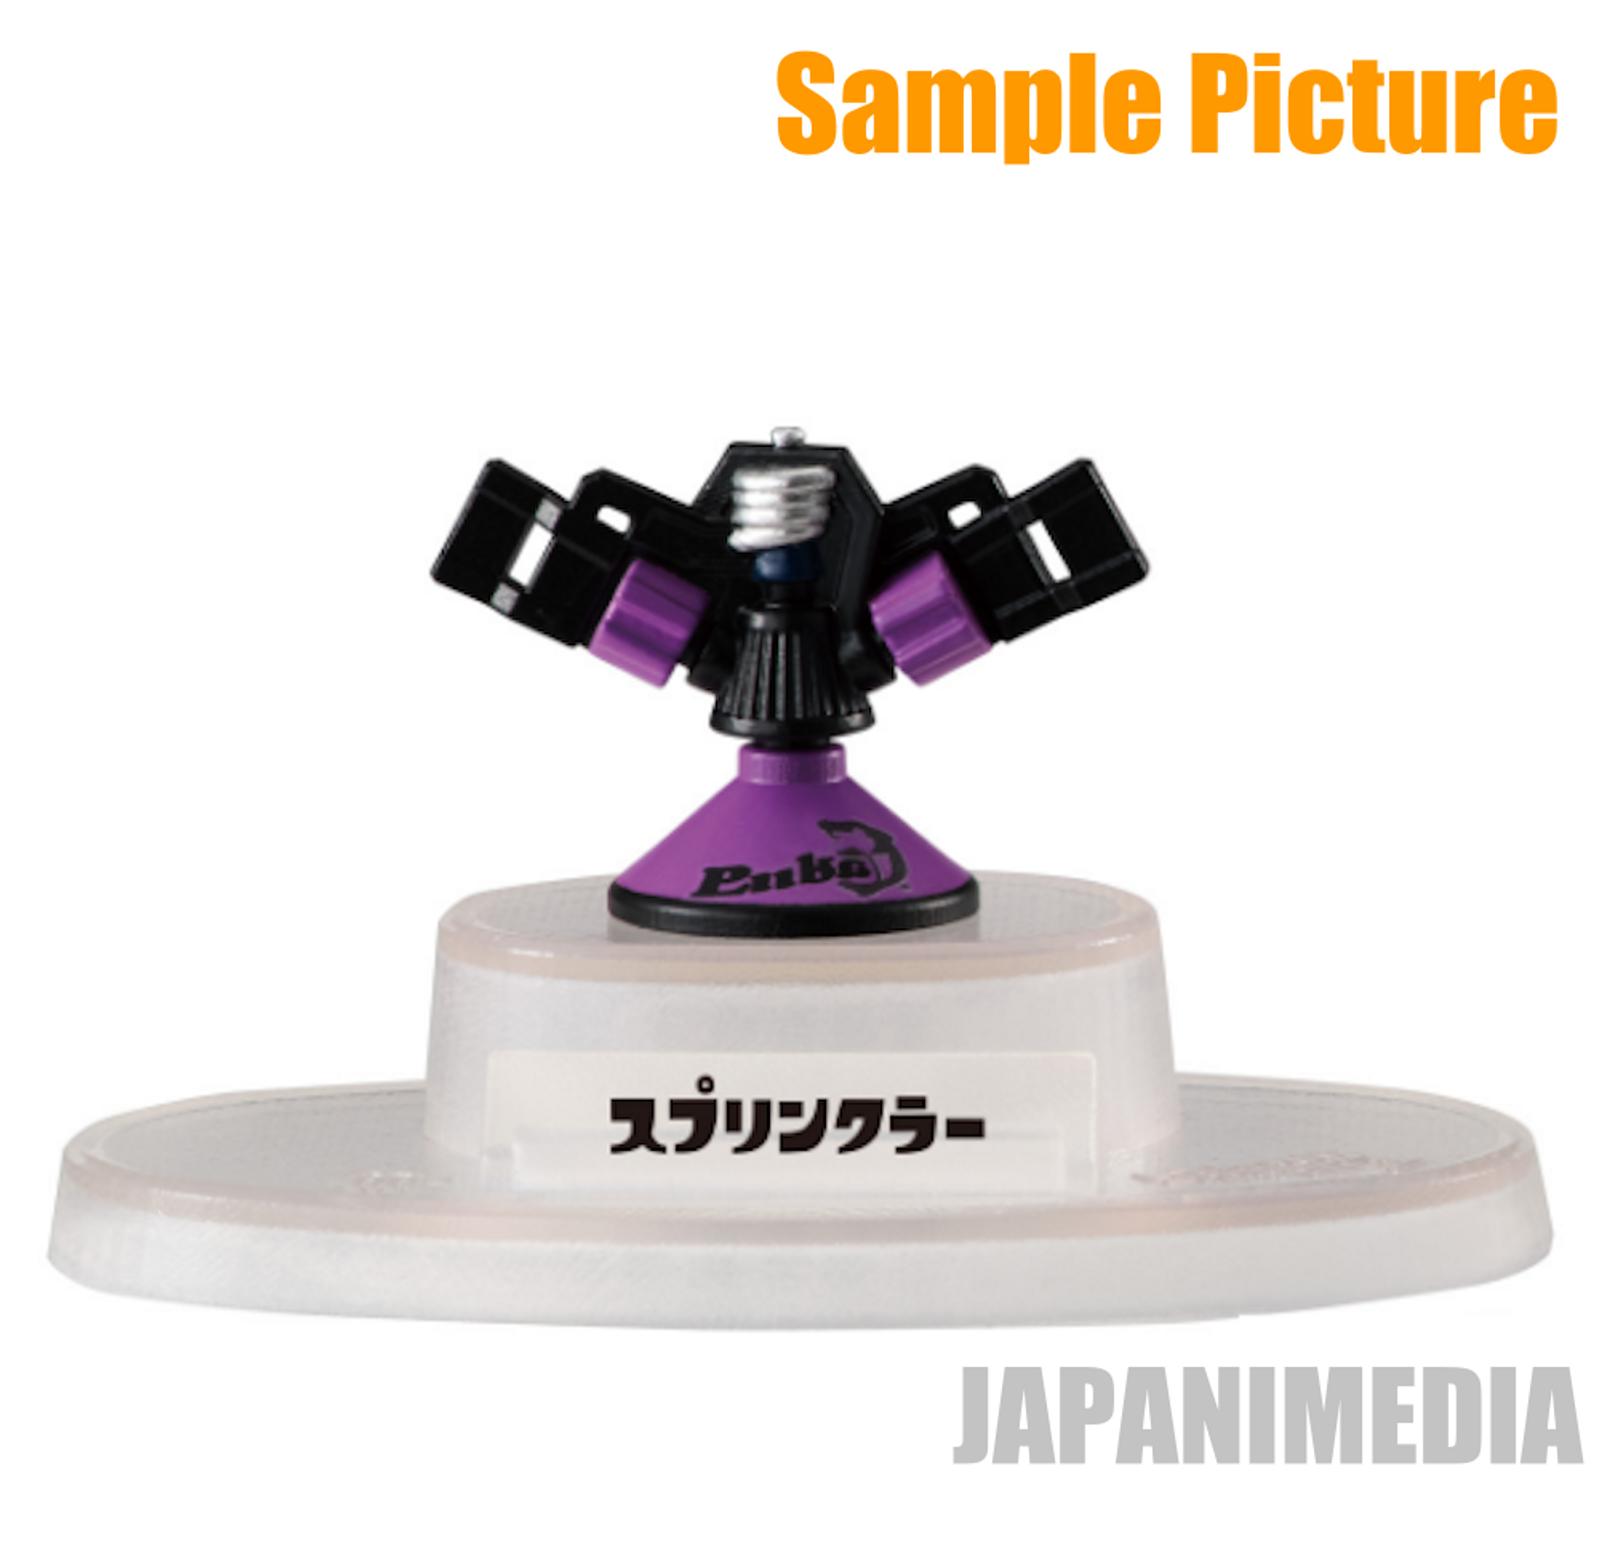 Splatoon 2 Sprinkler Sub Weapon Figure Collection JAPAN Nintendo Switch